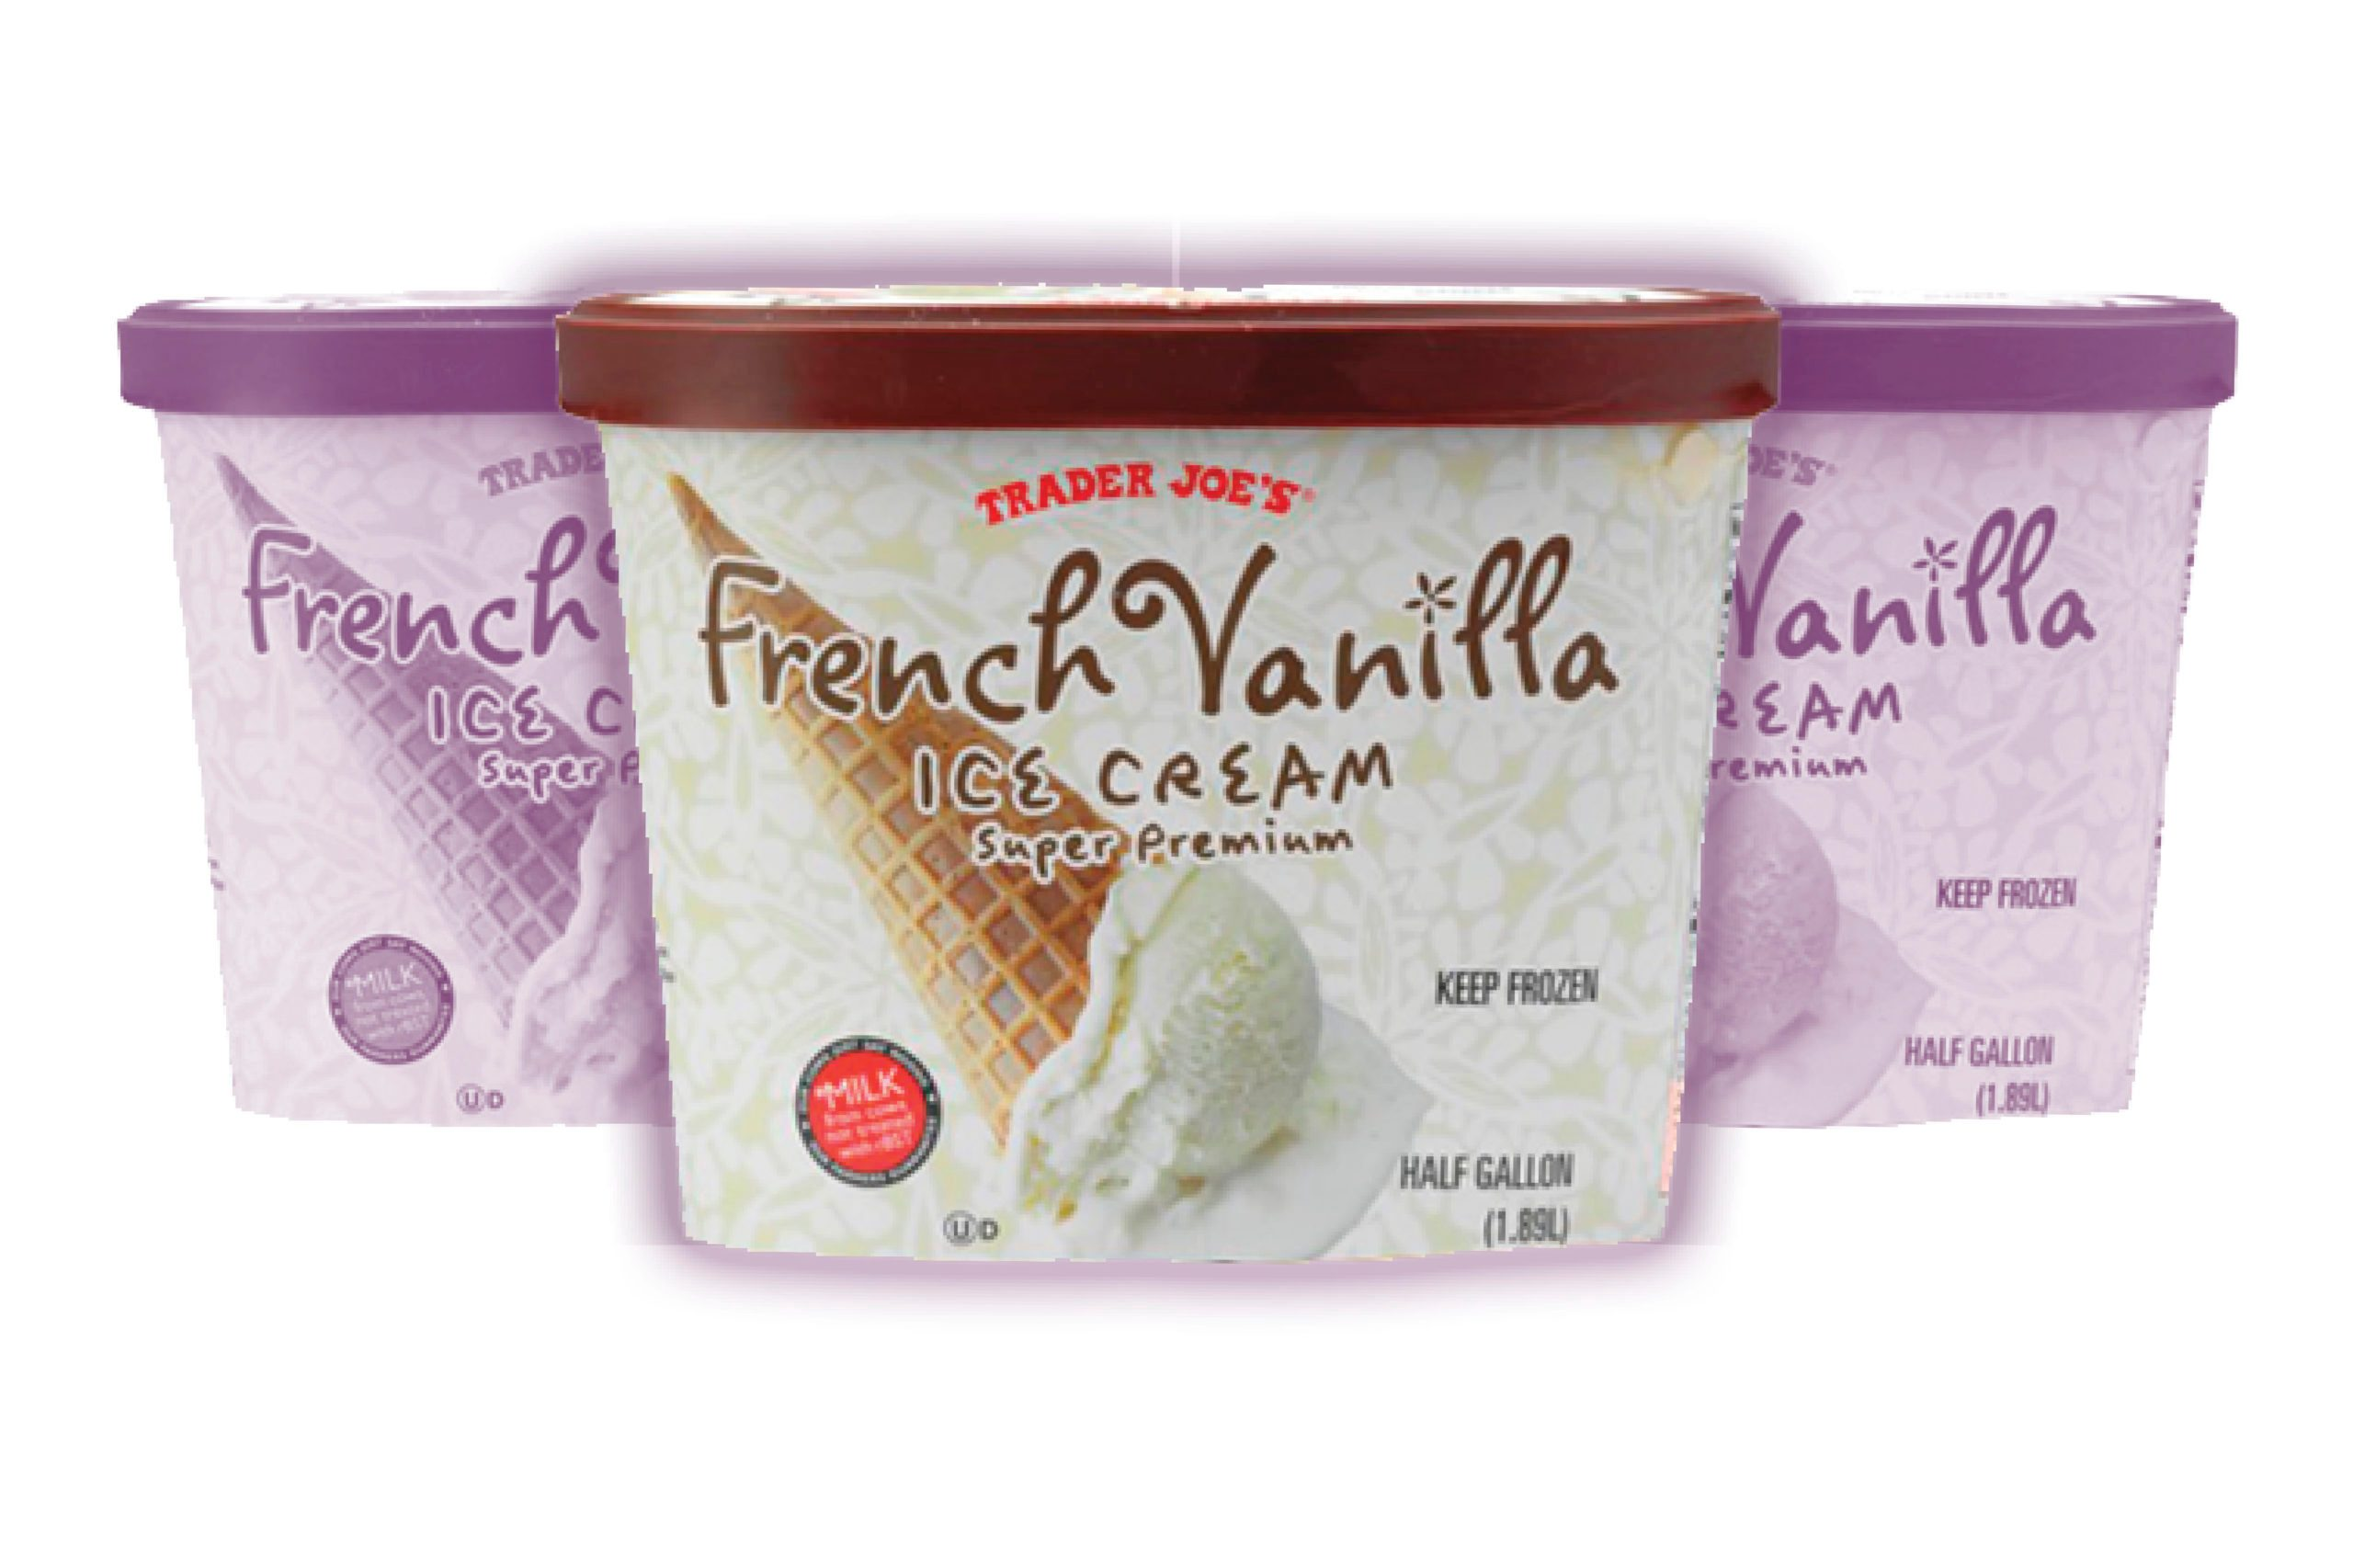 Trader Joes French Vanilla Ice Cream